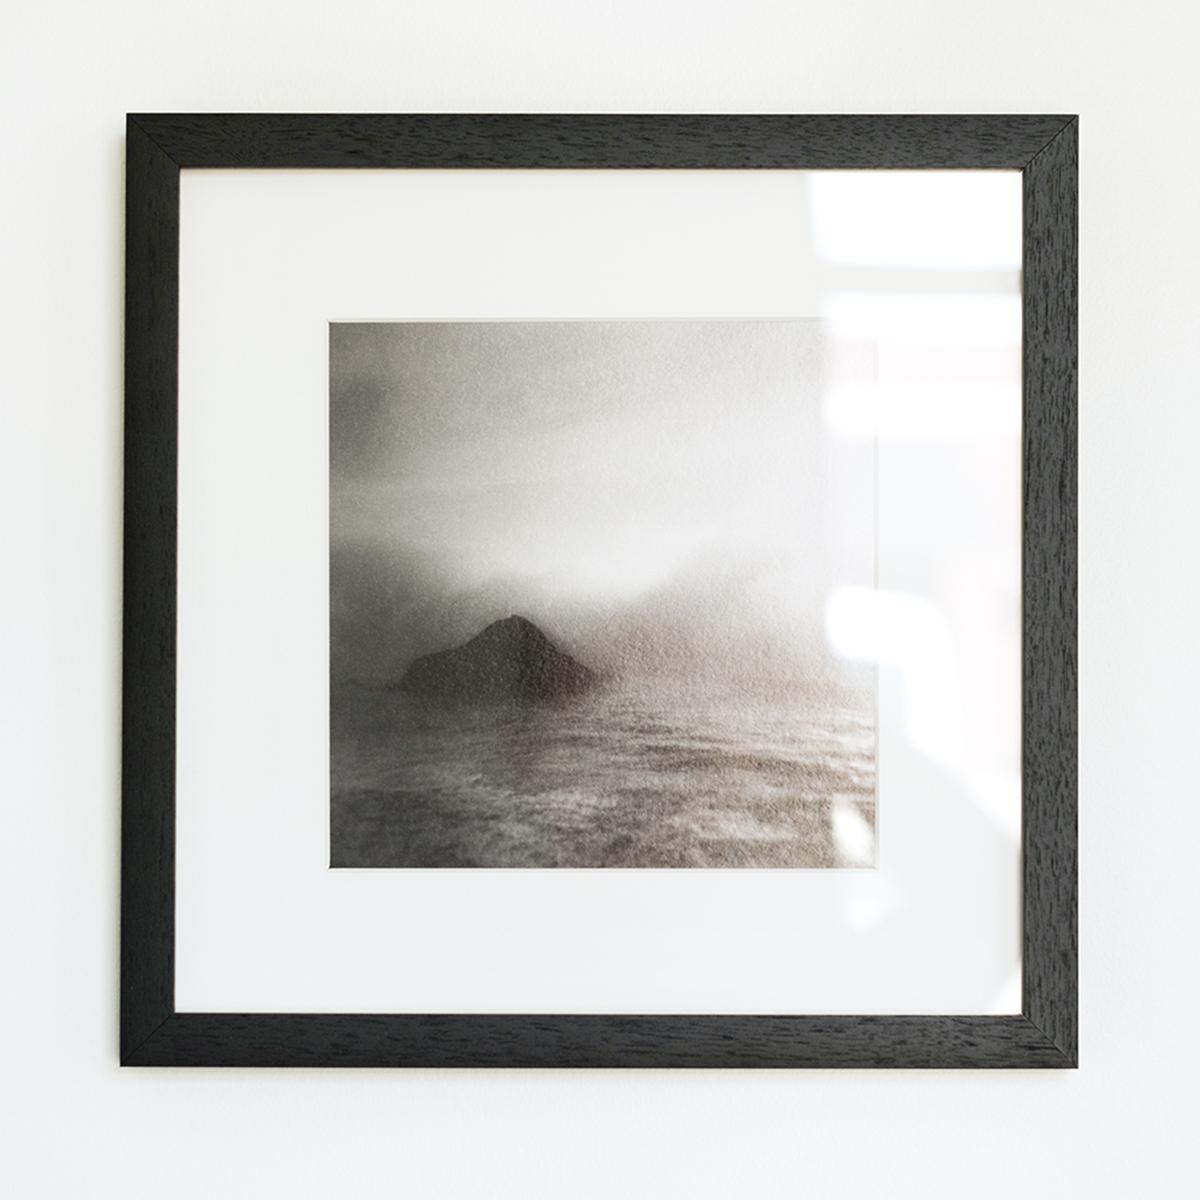 Standard Acrylic shows glare (upper right)